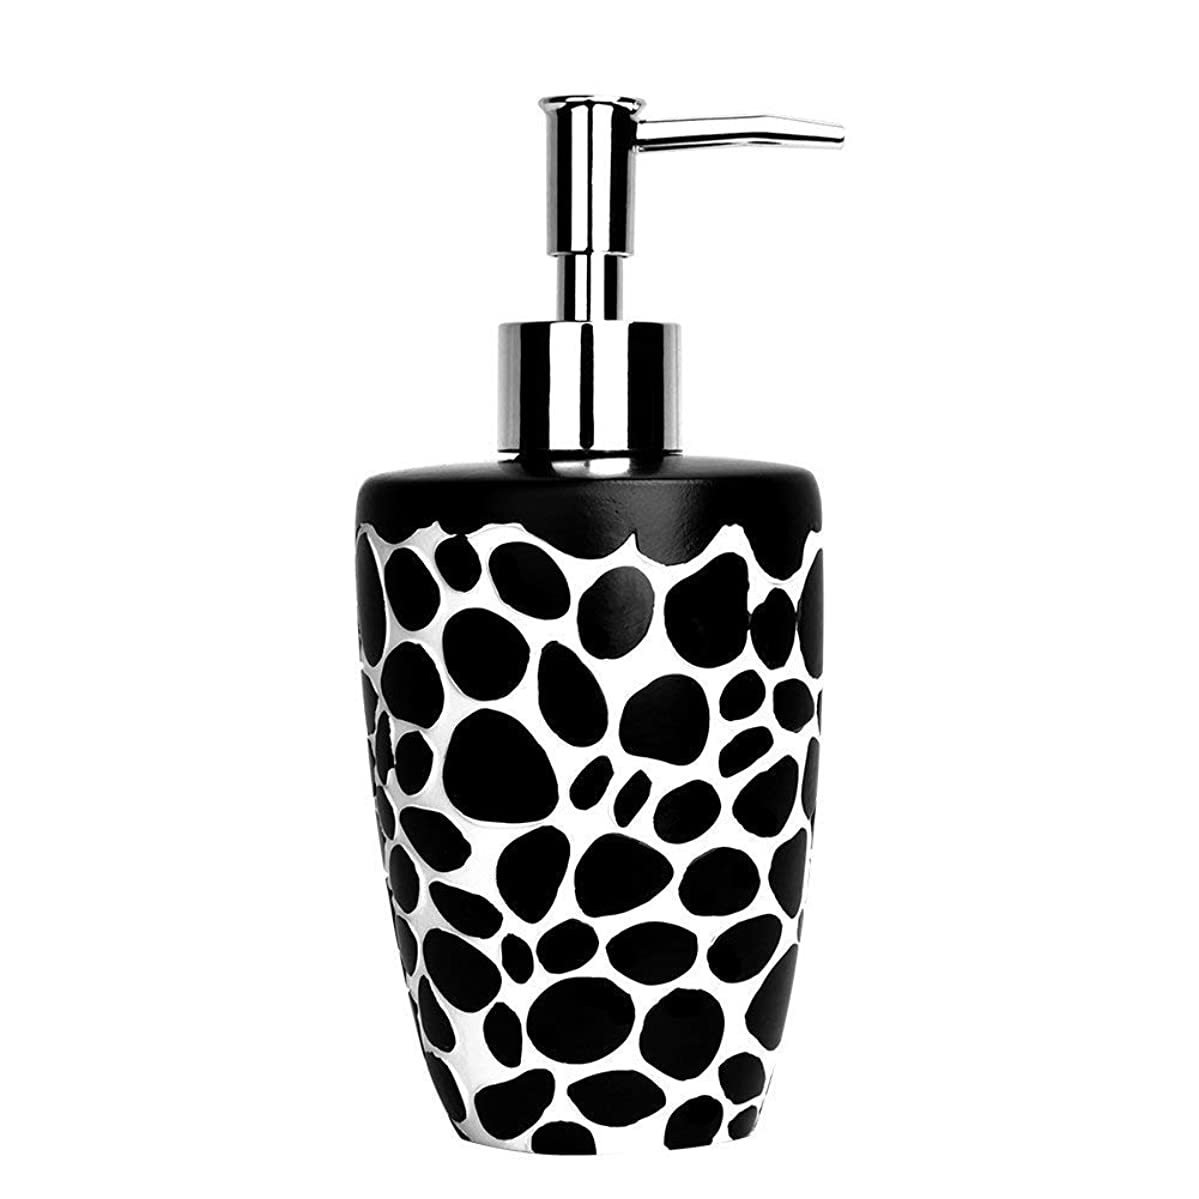 Tornadooo 16 oz. Soap Dispenser Bottles, Ceramic Hand Kitchen Soap Dispenser Great for Essential Oils, Lotions, Liquid Soaps